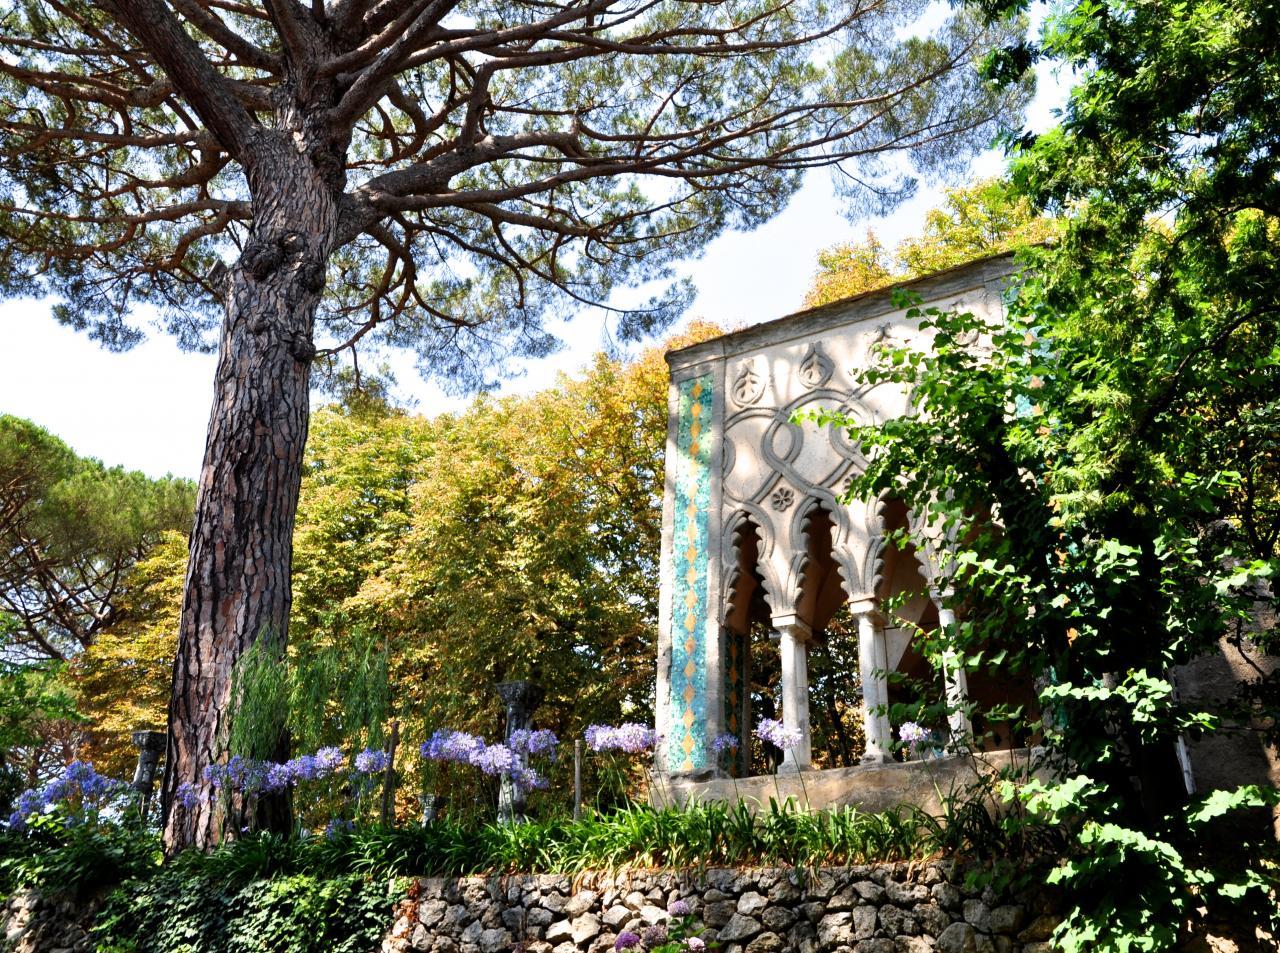 Villa Cimbrone à Ravello - Campanie - Juillet 2017